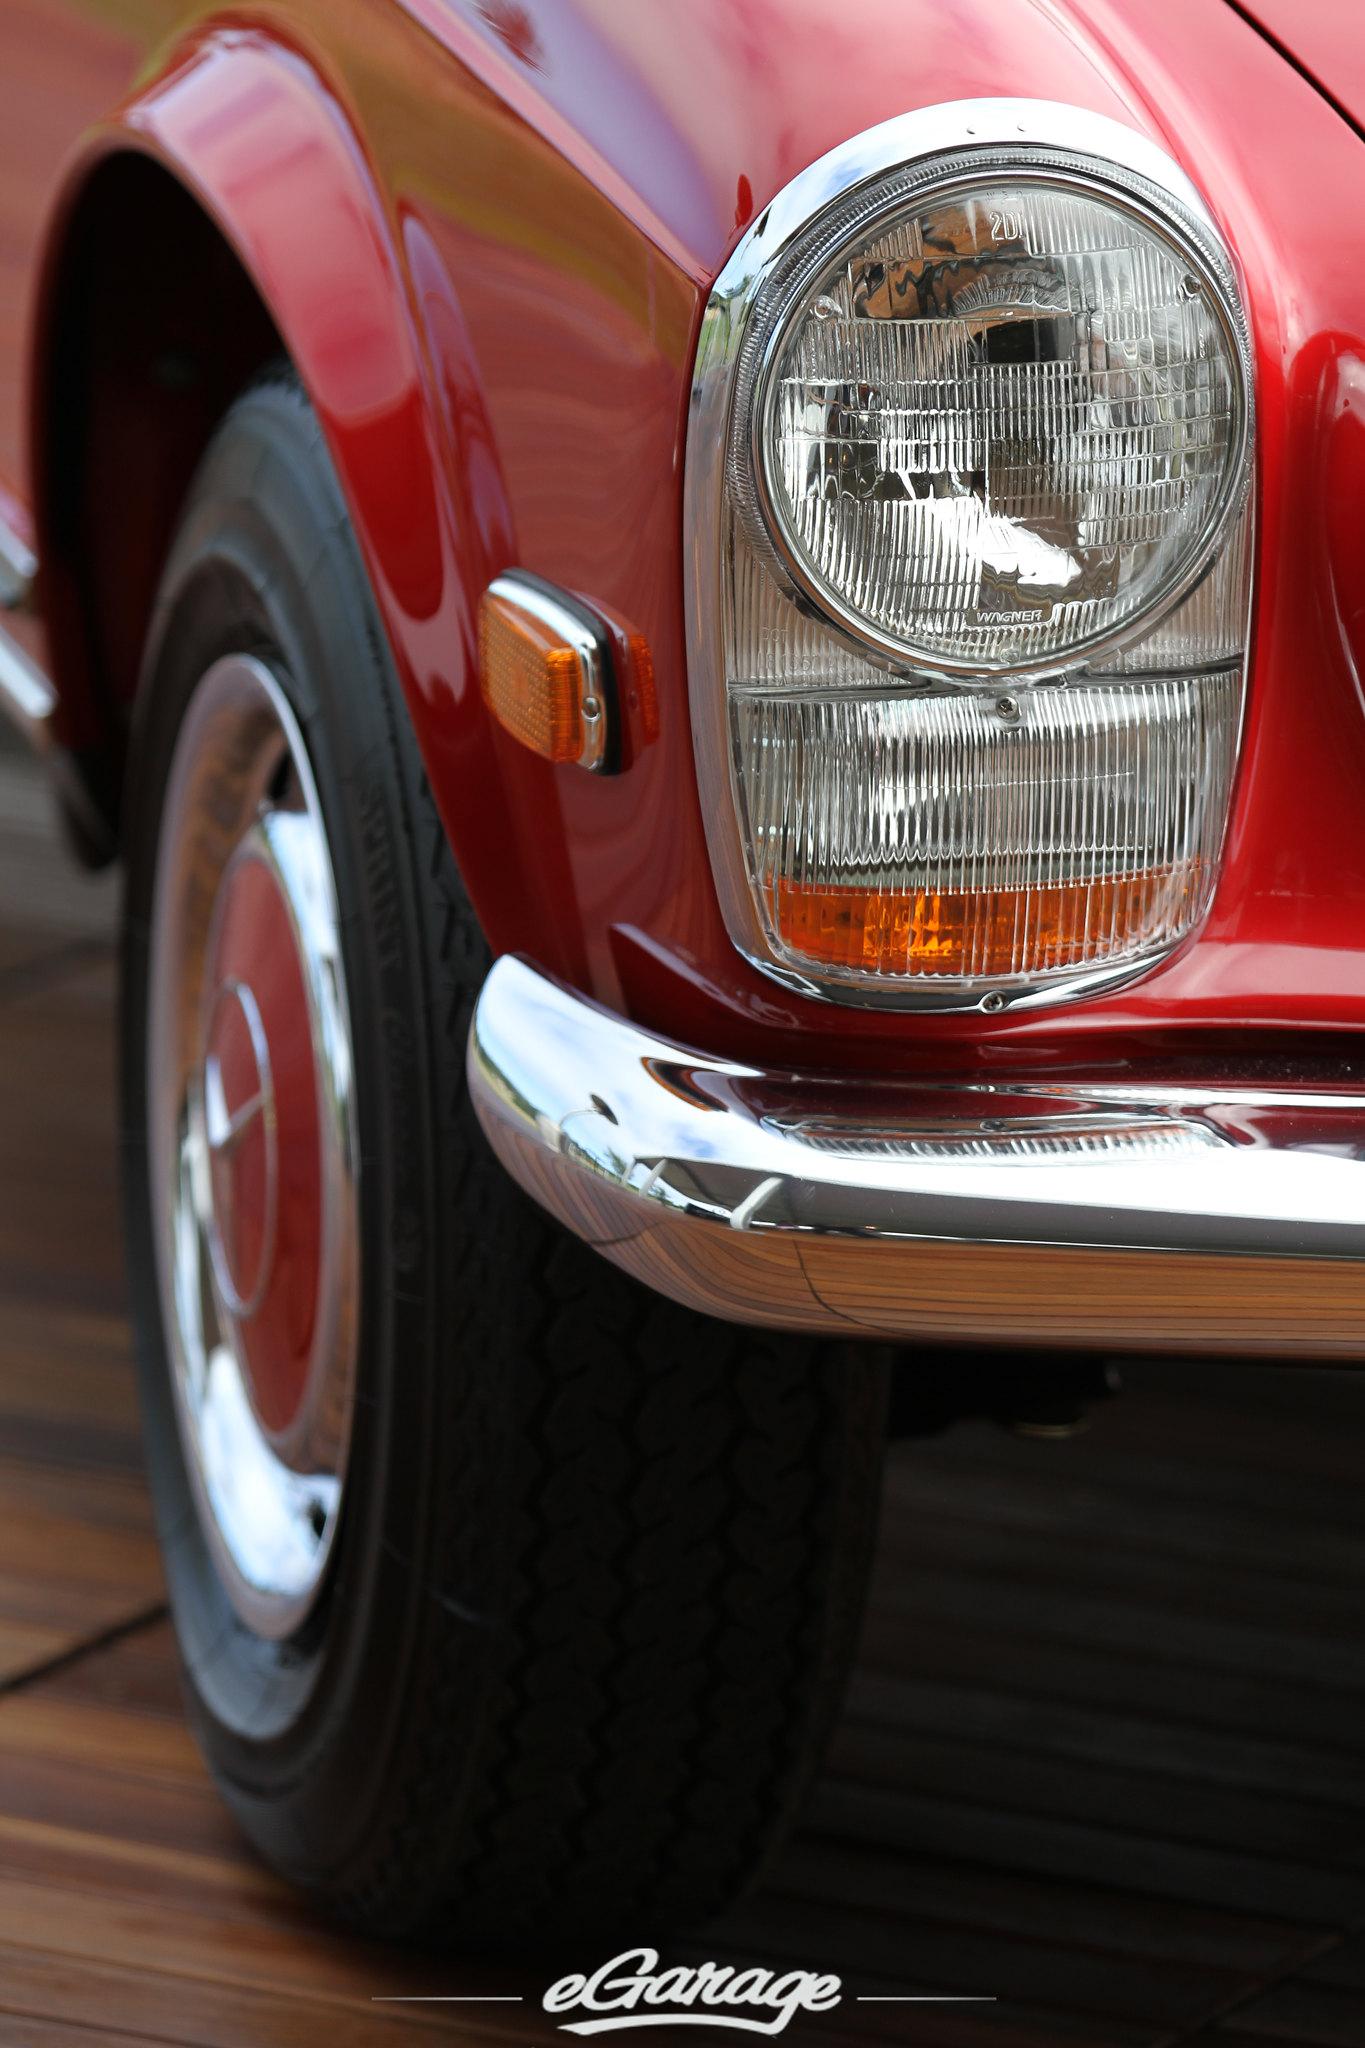 7828740816 eb0bf61a07 k Mercedes Benz Classic